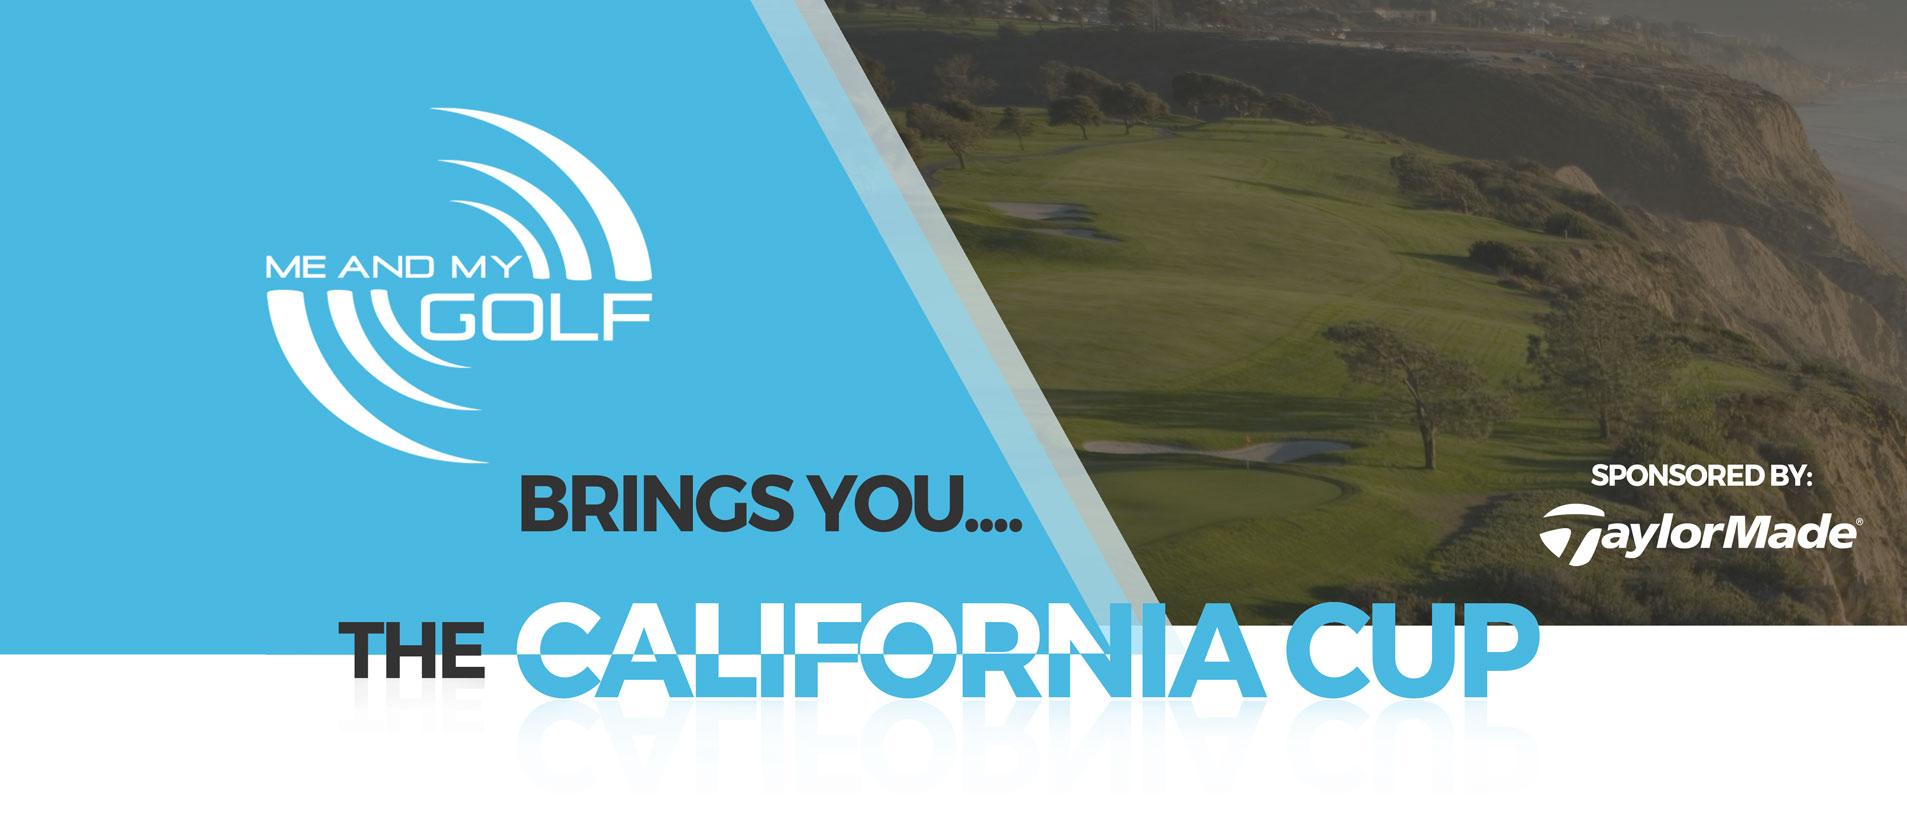 California Cup TaylorMade Golf